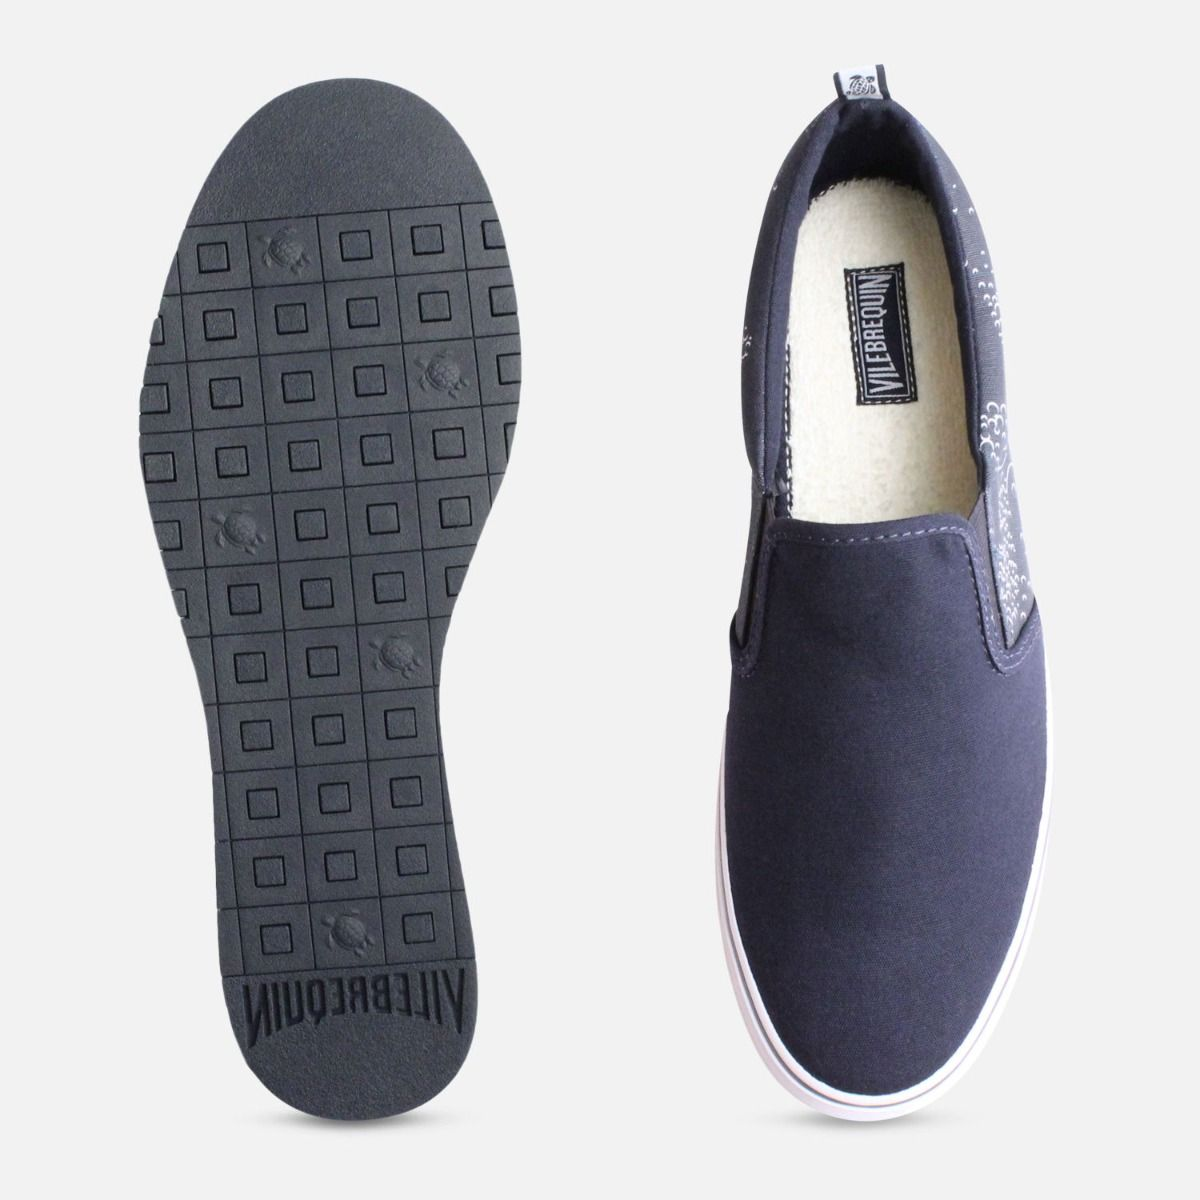 Vilebrequin Mens Navy Slip On Shoes